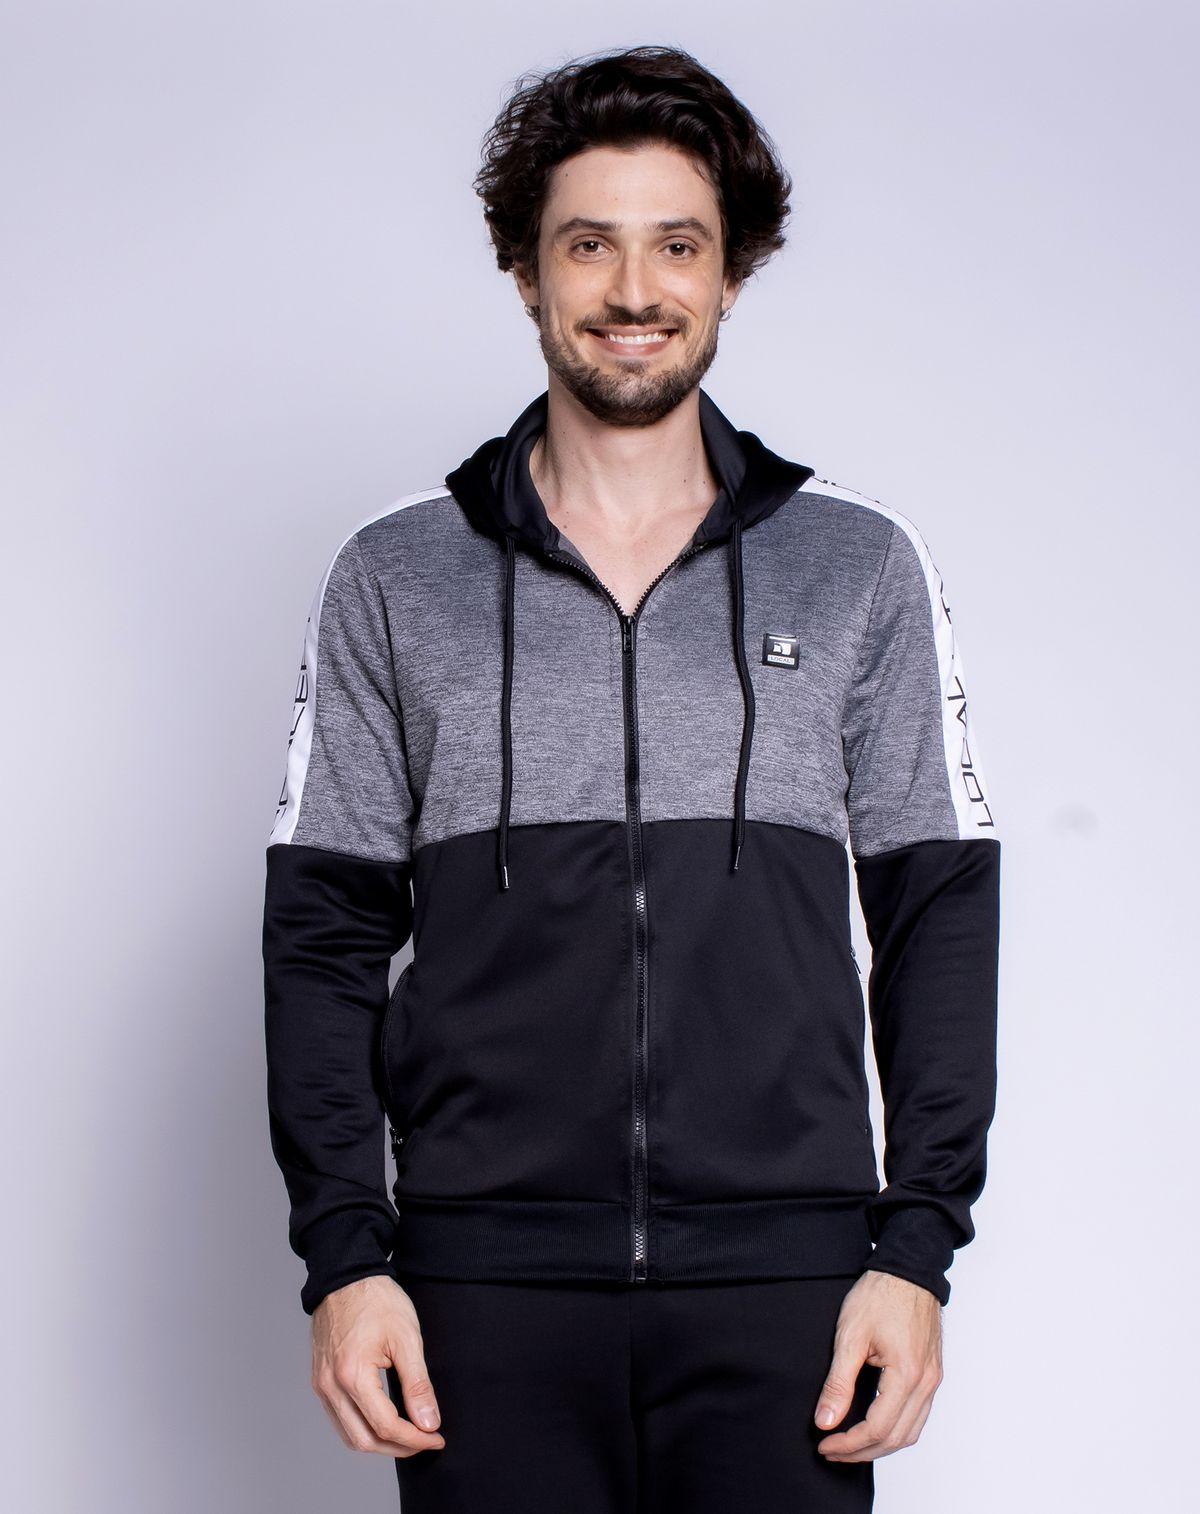 605740002-jaqueta-malha-masculina-recortes-capuz-preto-m-e0e